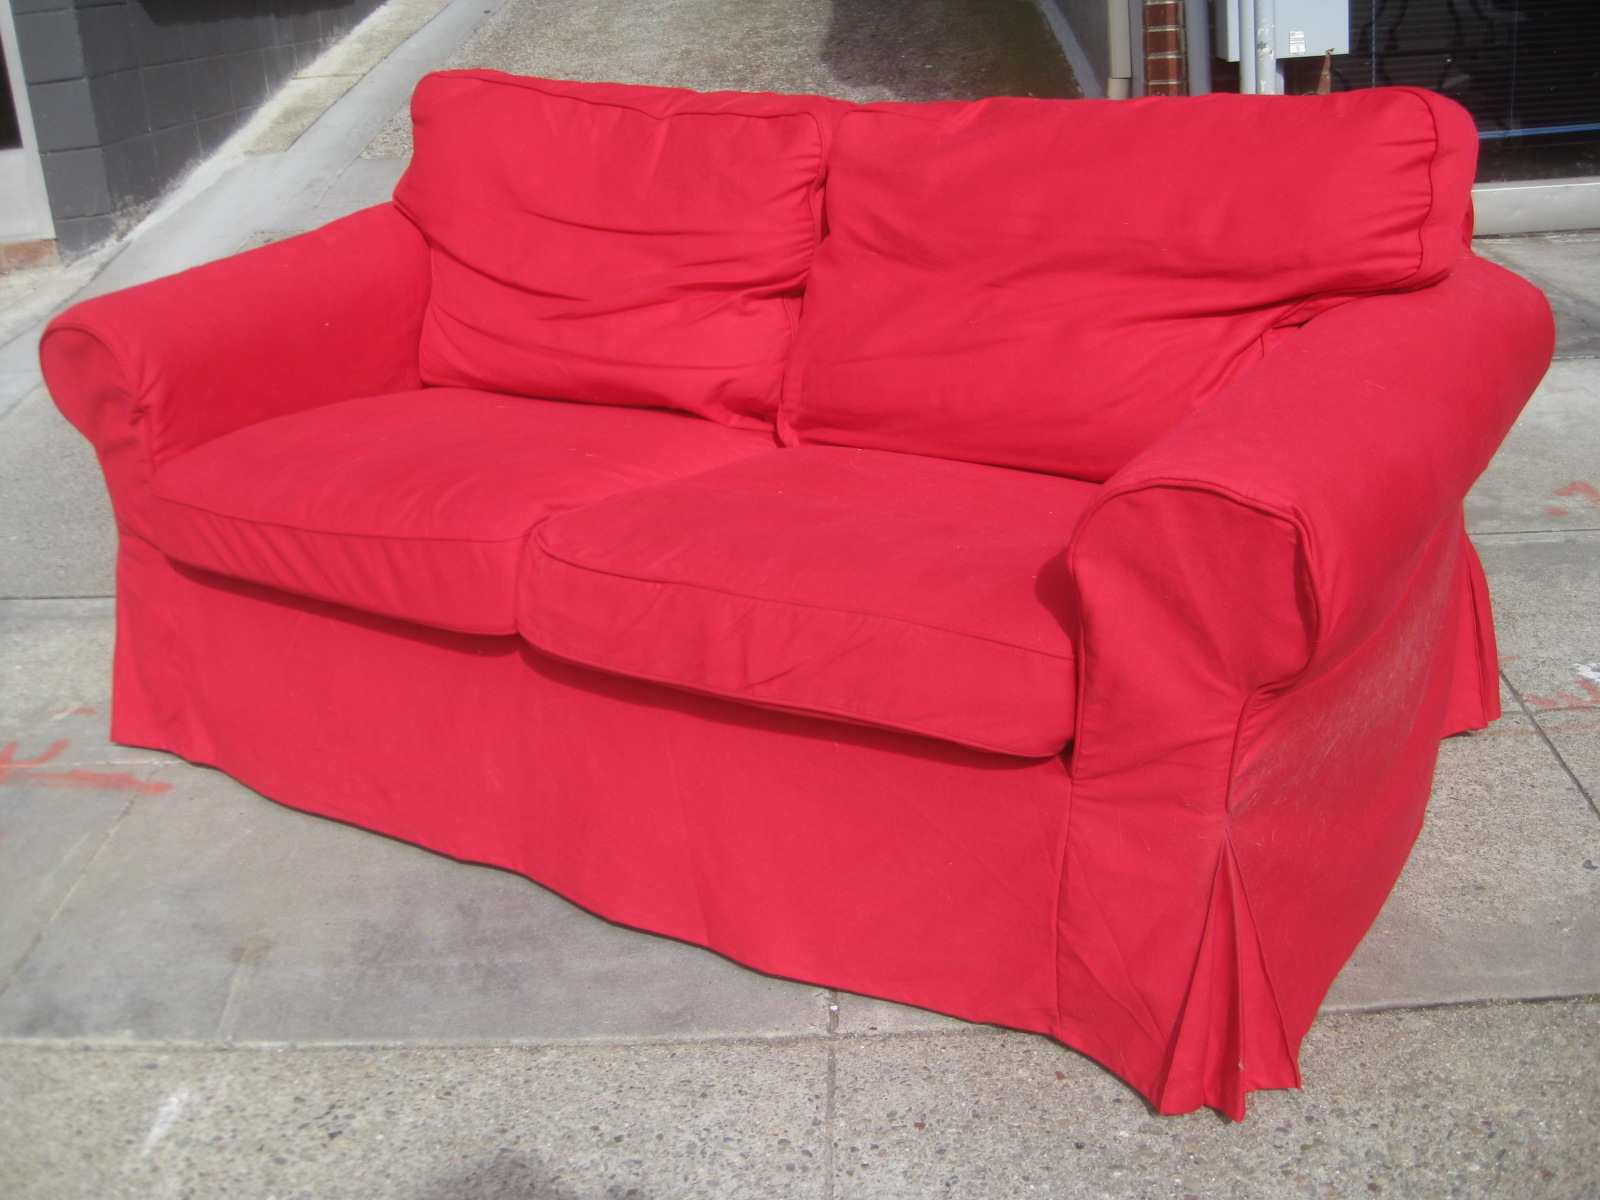 UHURU FURNITURE COLLECTIBLES SOLD Red Ikea Sofa 120